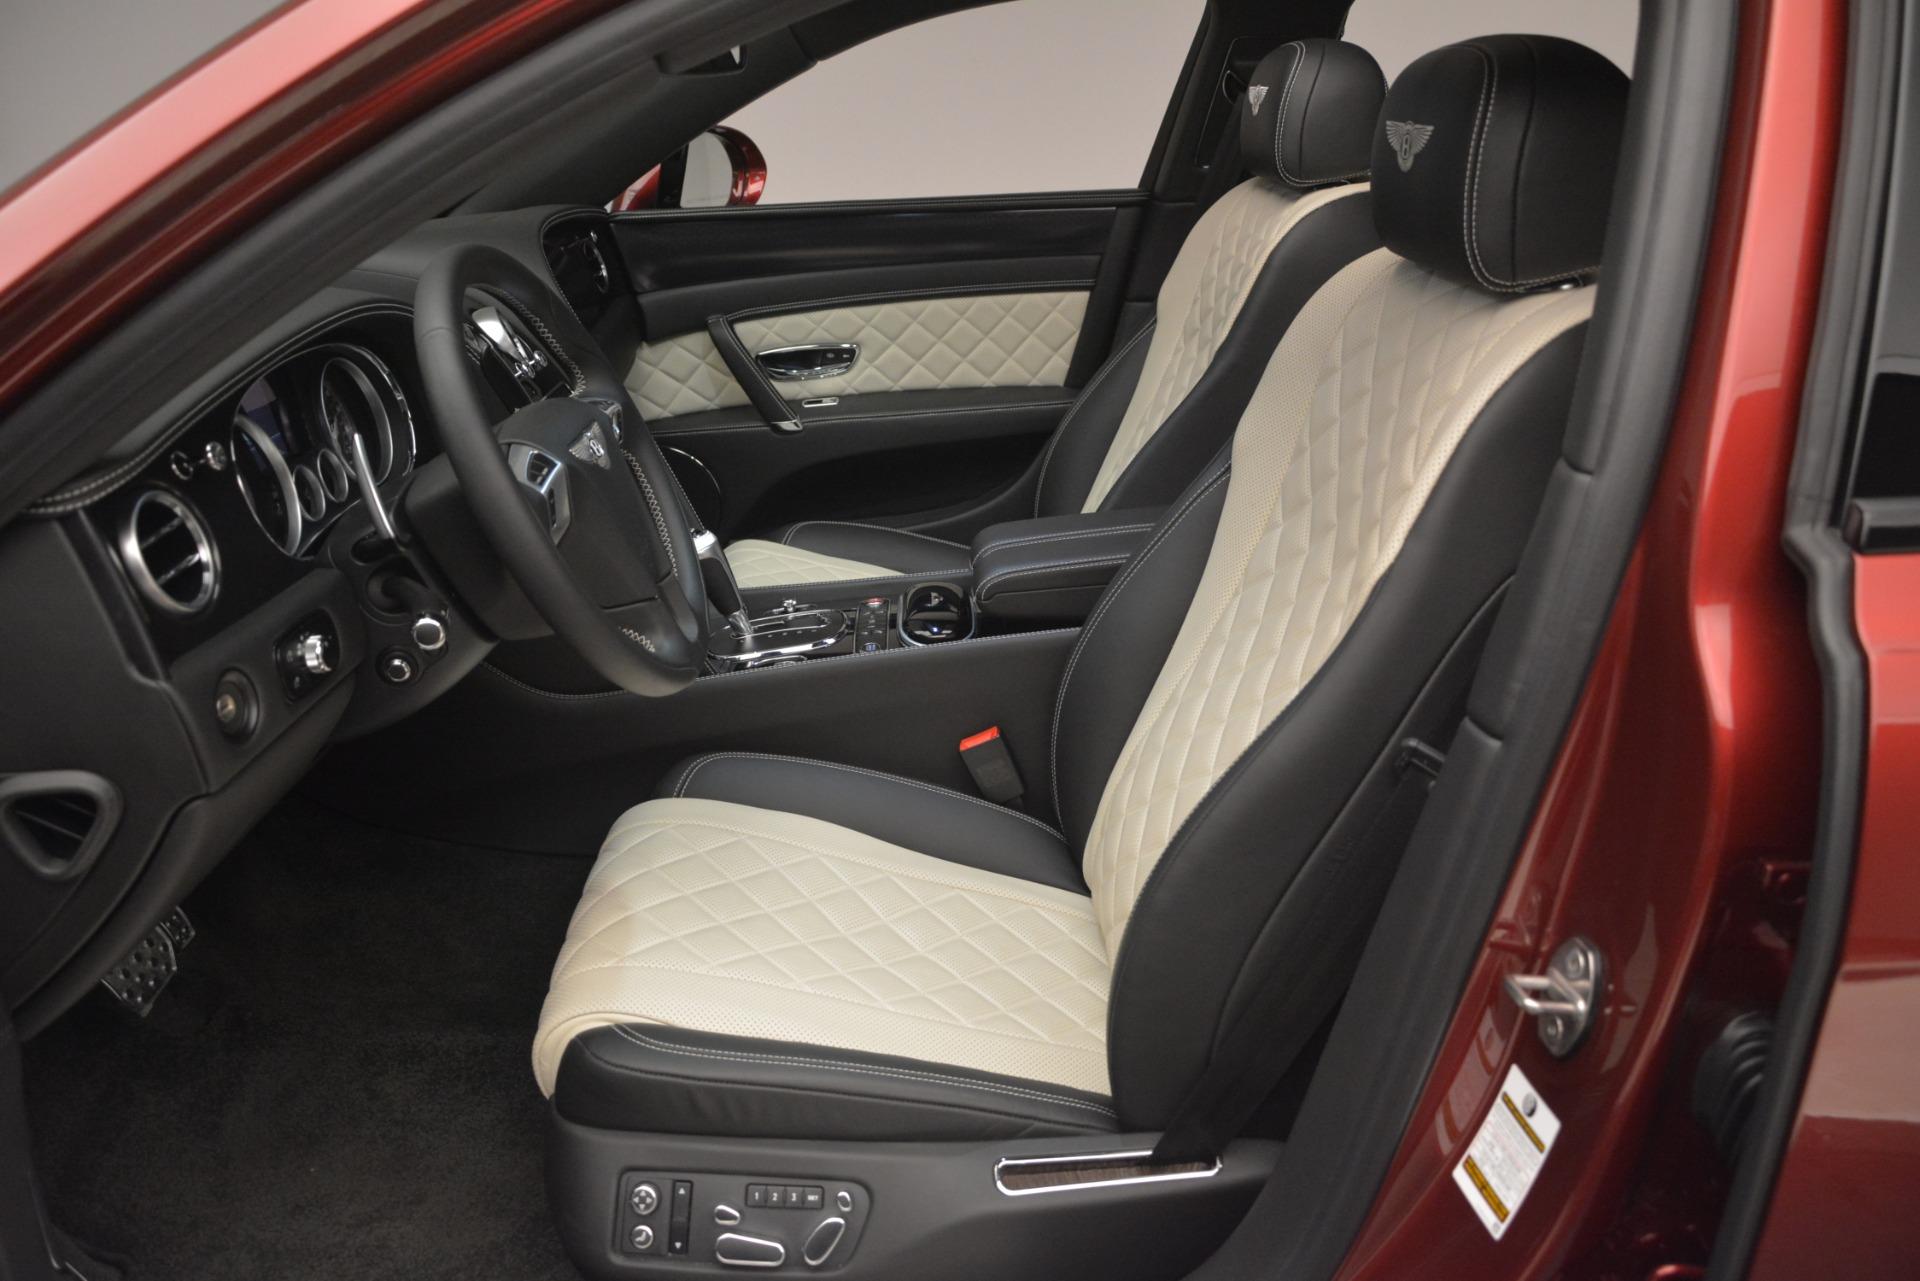 Used 2018 Bentley Flying Spur W12 S For Sale In Westport, CT 3014_p19